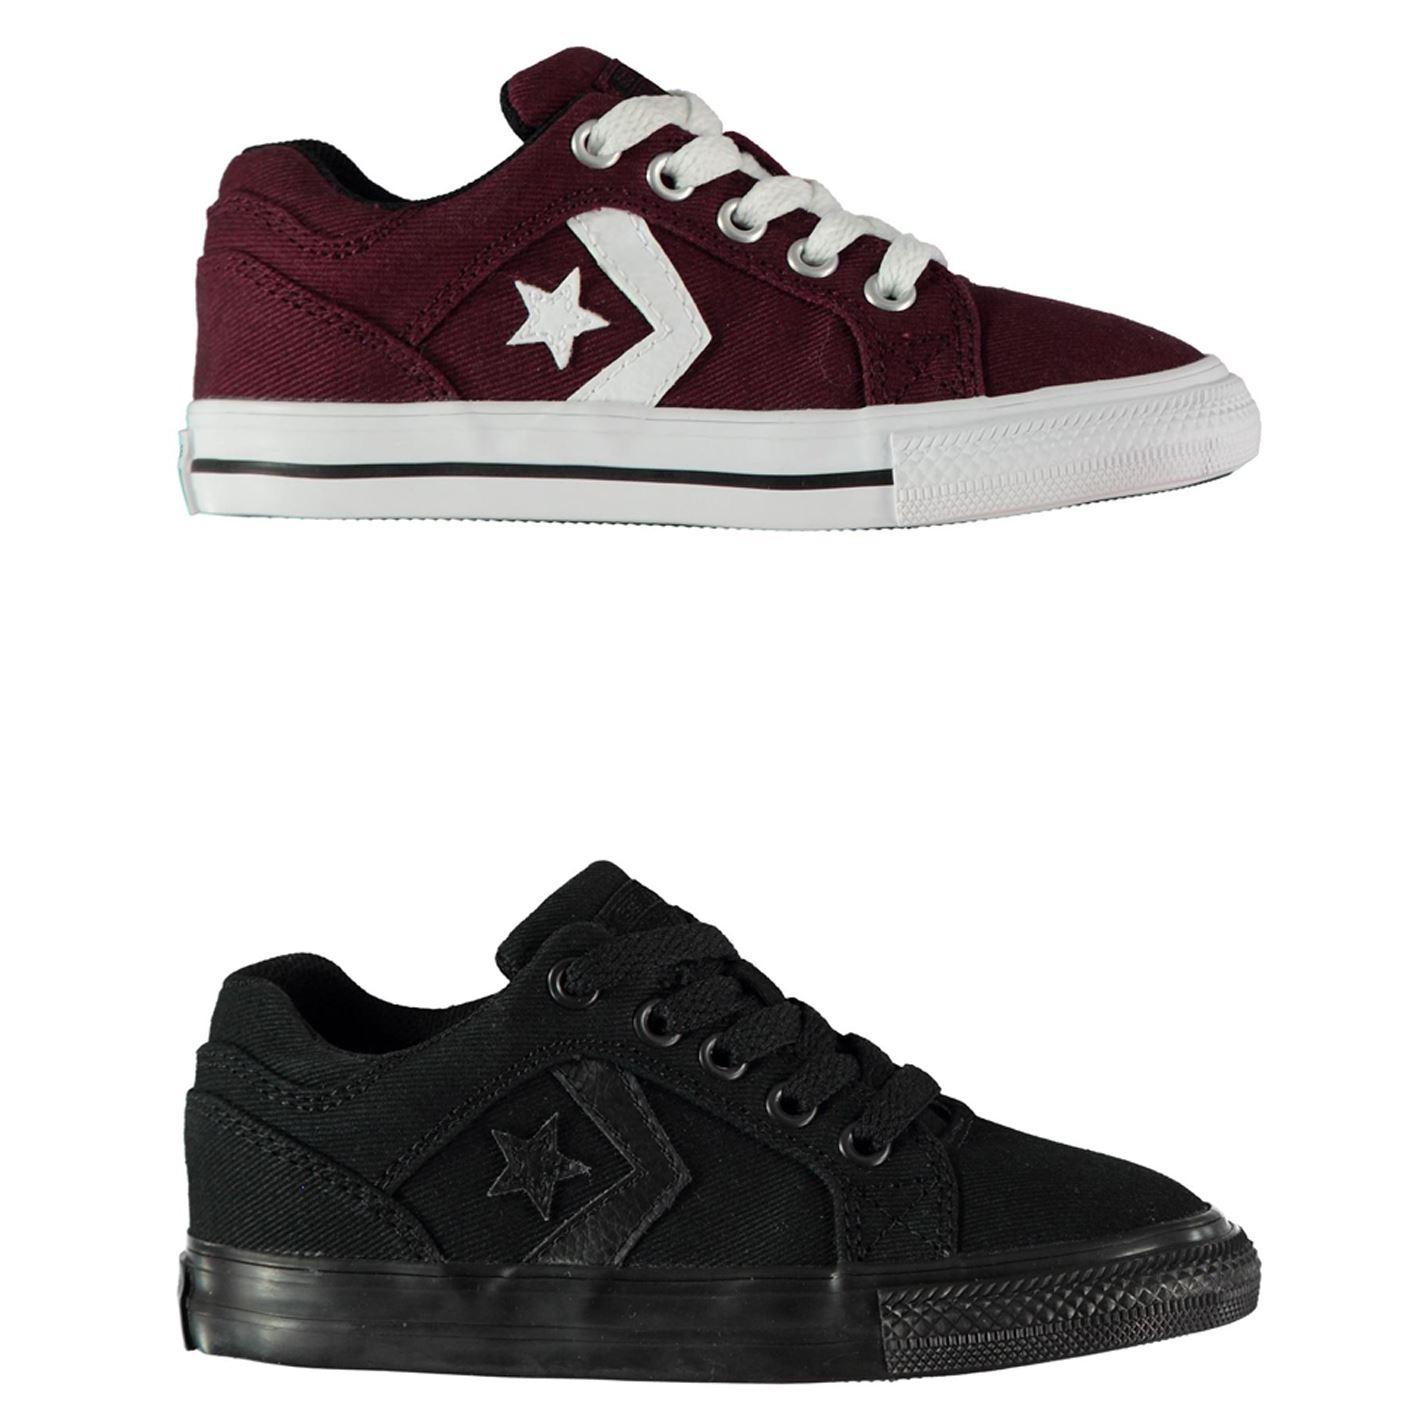 Details about Converse El Distrito Trainers Boys Shoes Footwear